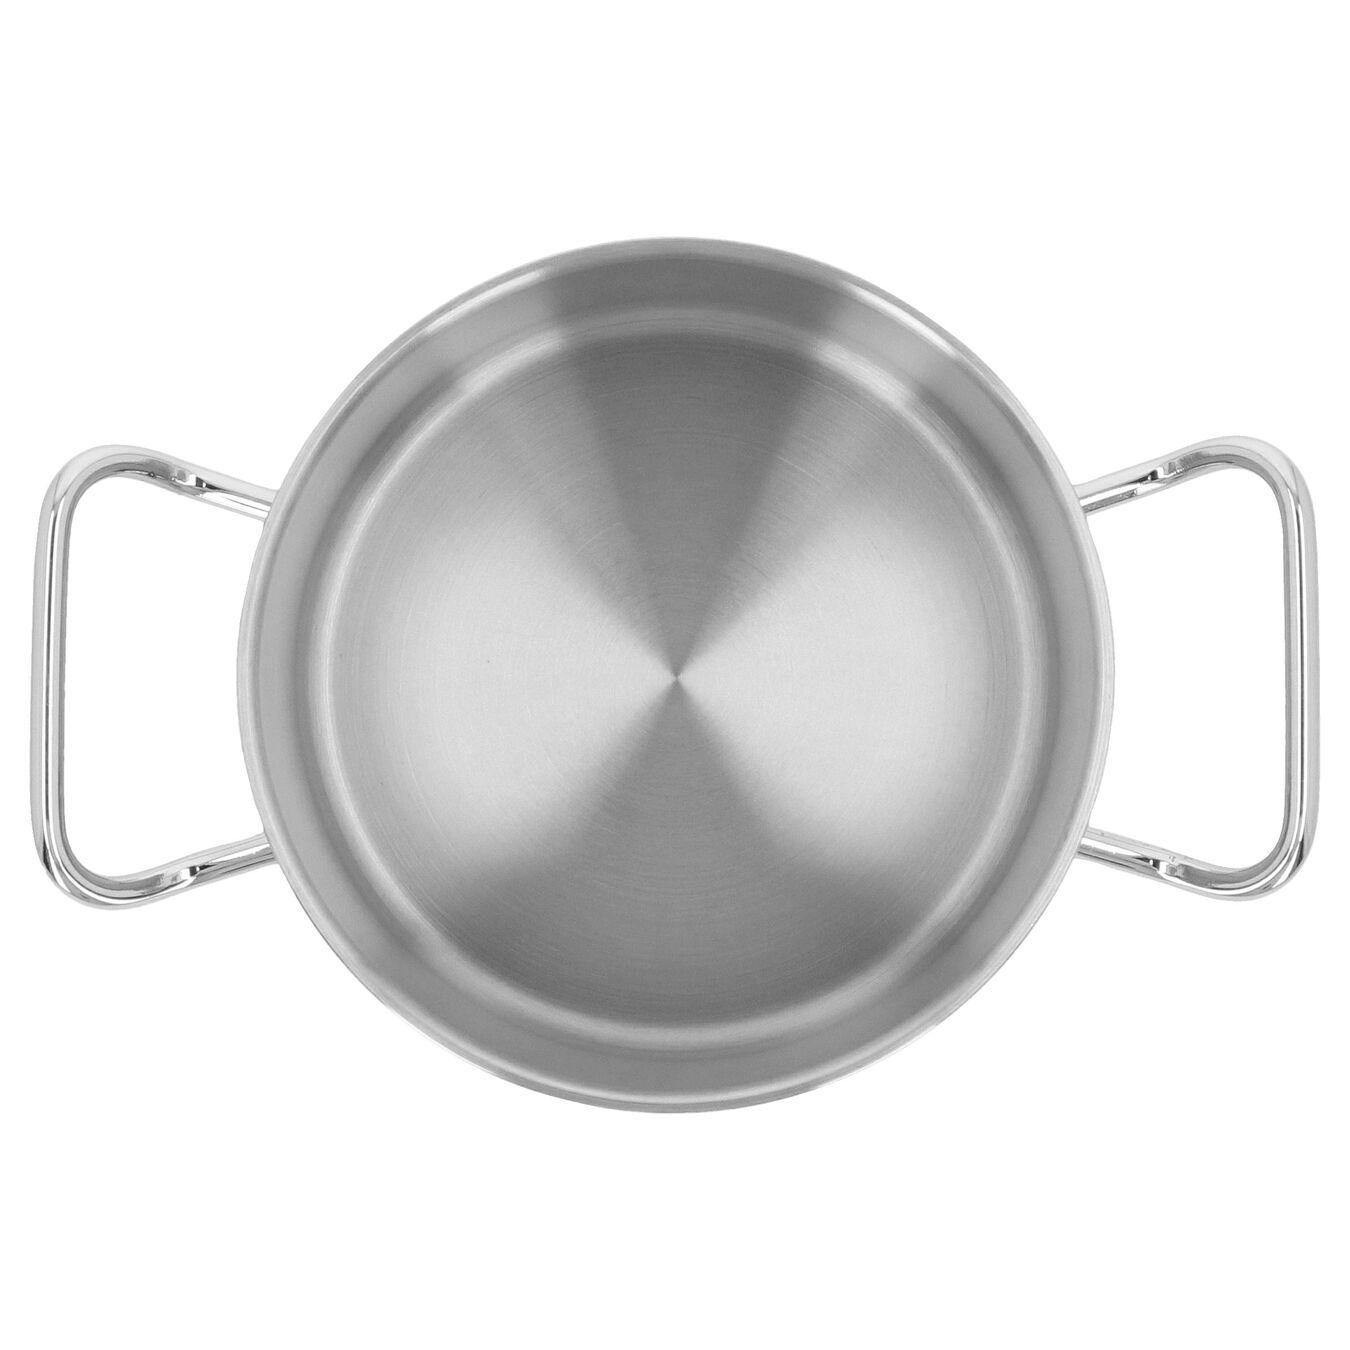 Kookpot met deksel 18 cm / 2 l,,large 3